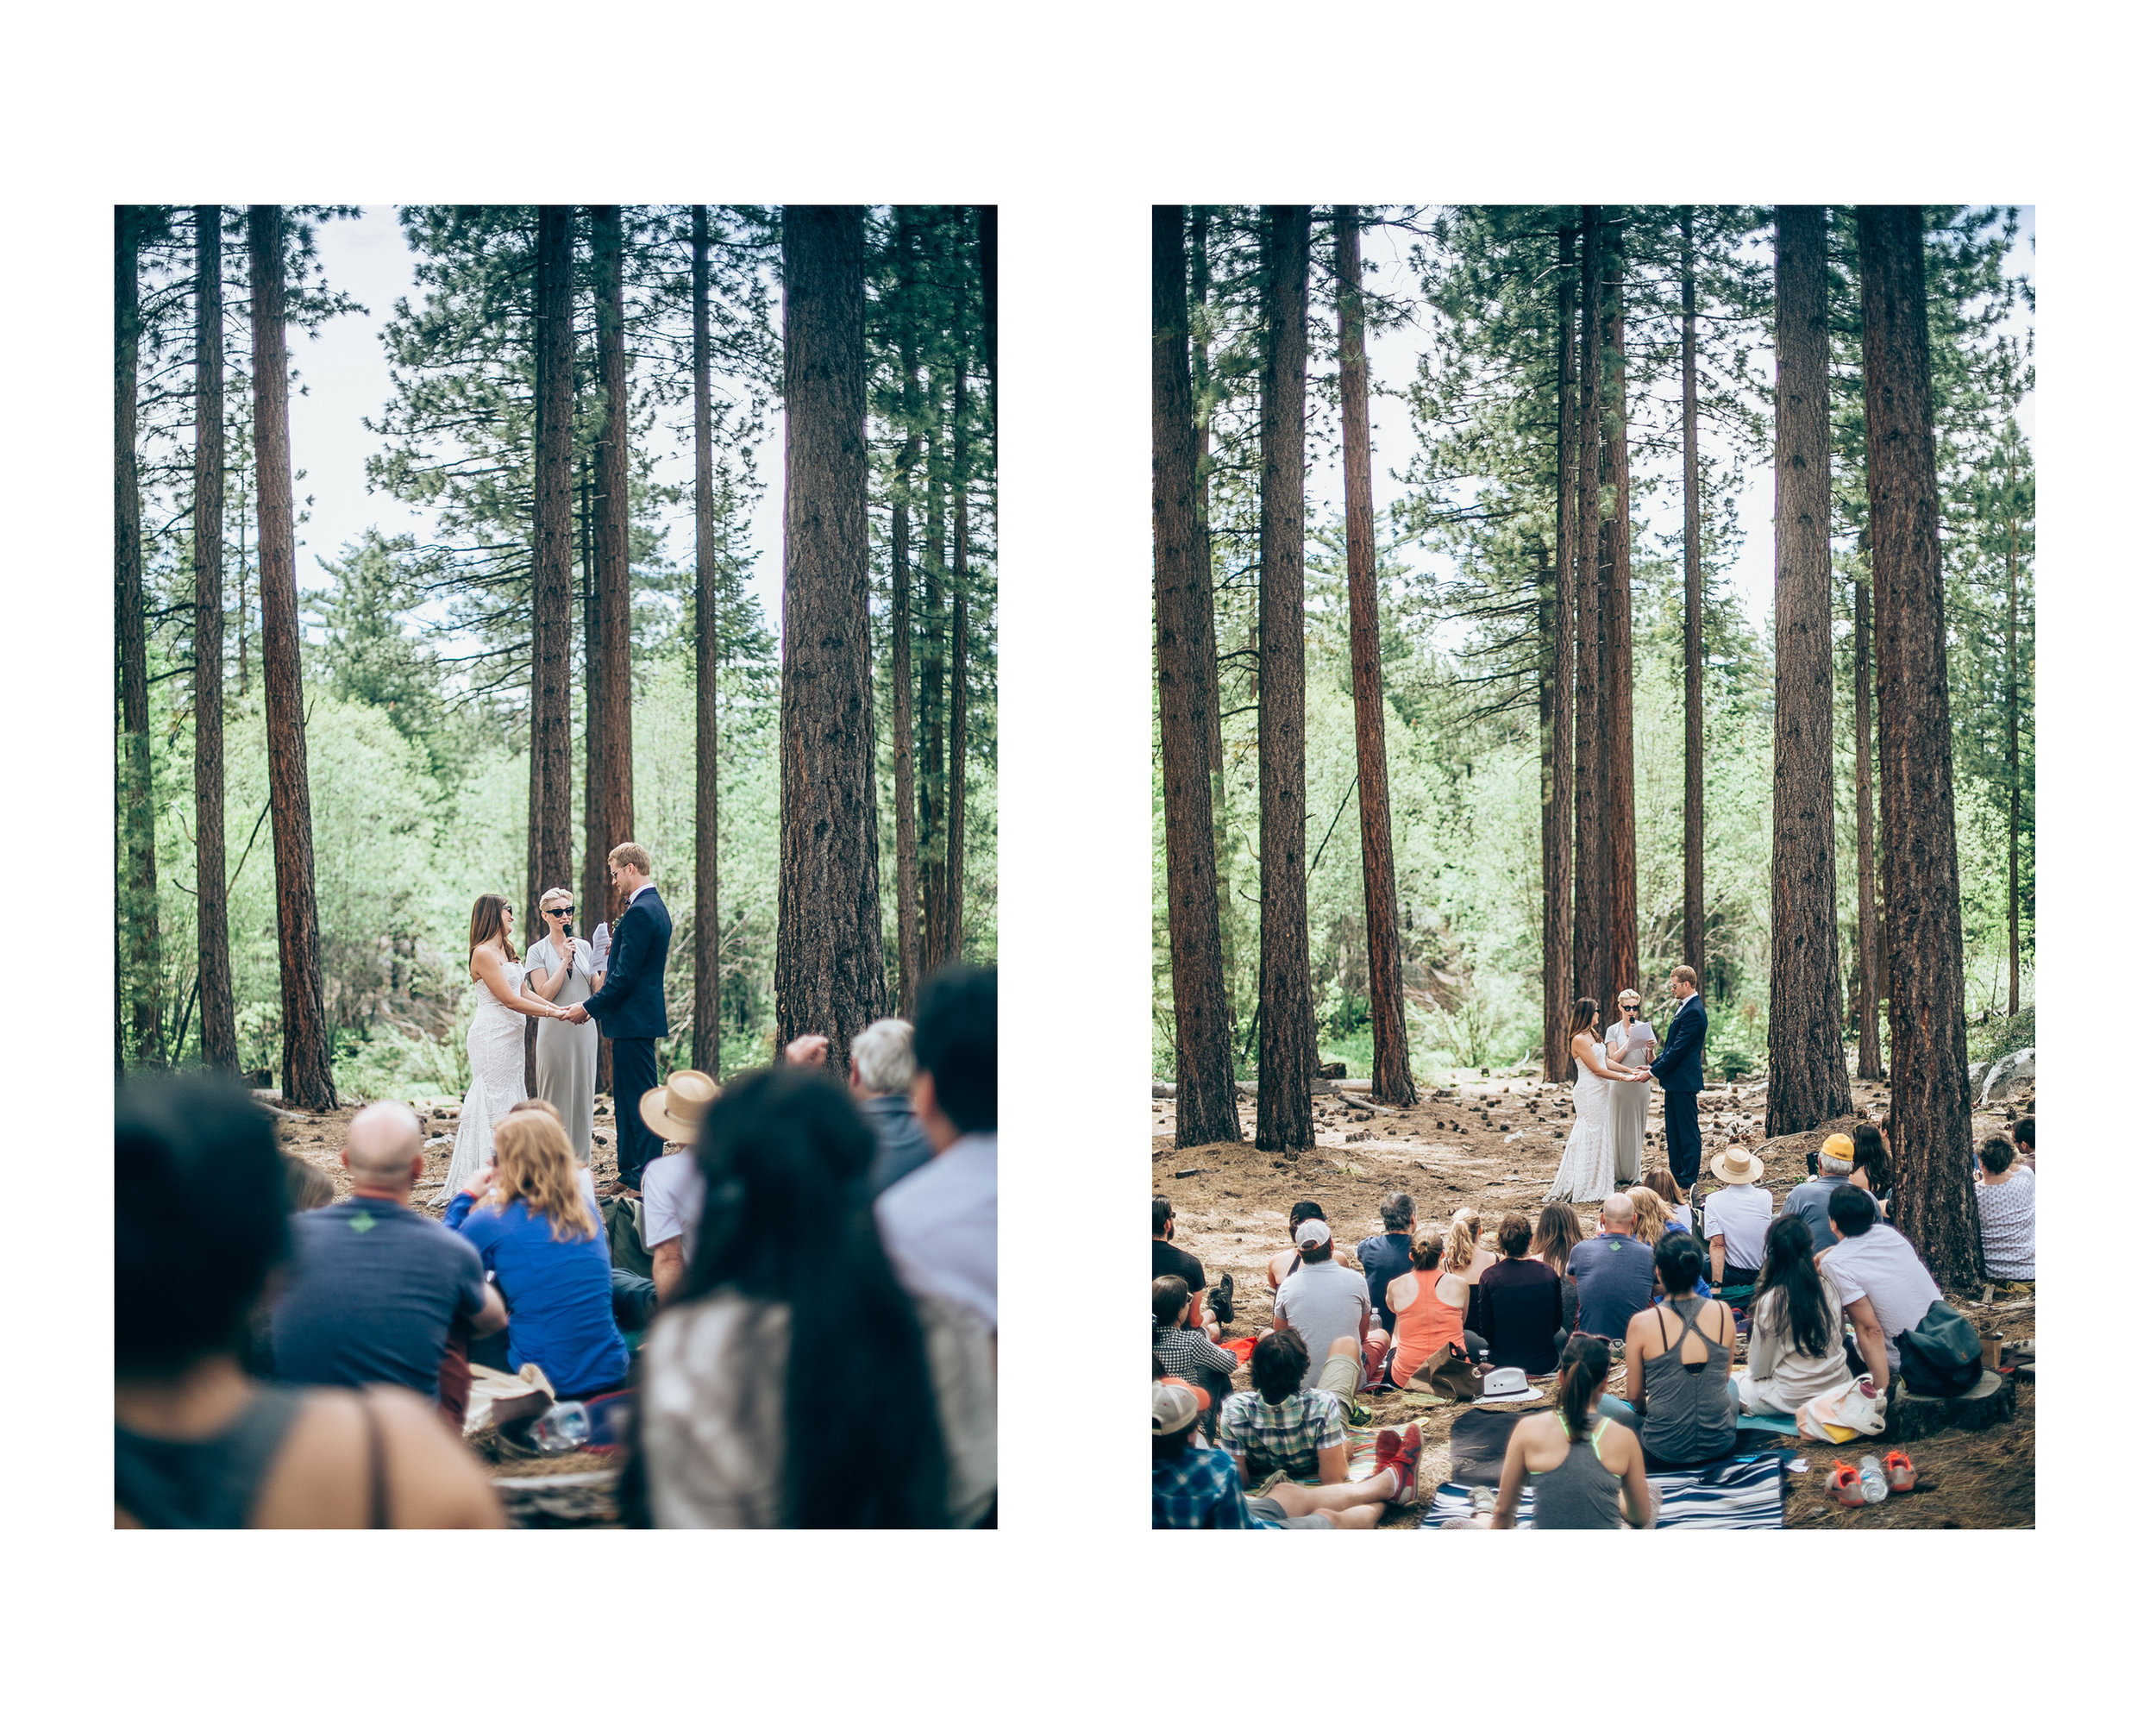 Melisa&David_Wedding_Day_015.jpg